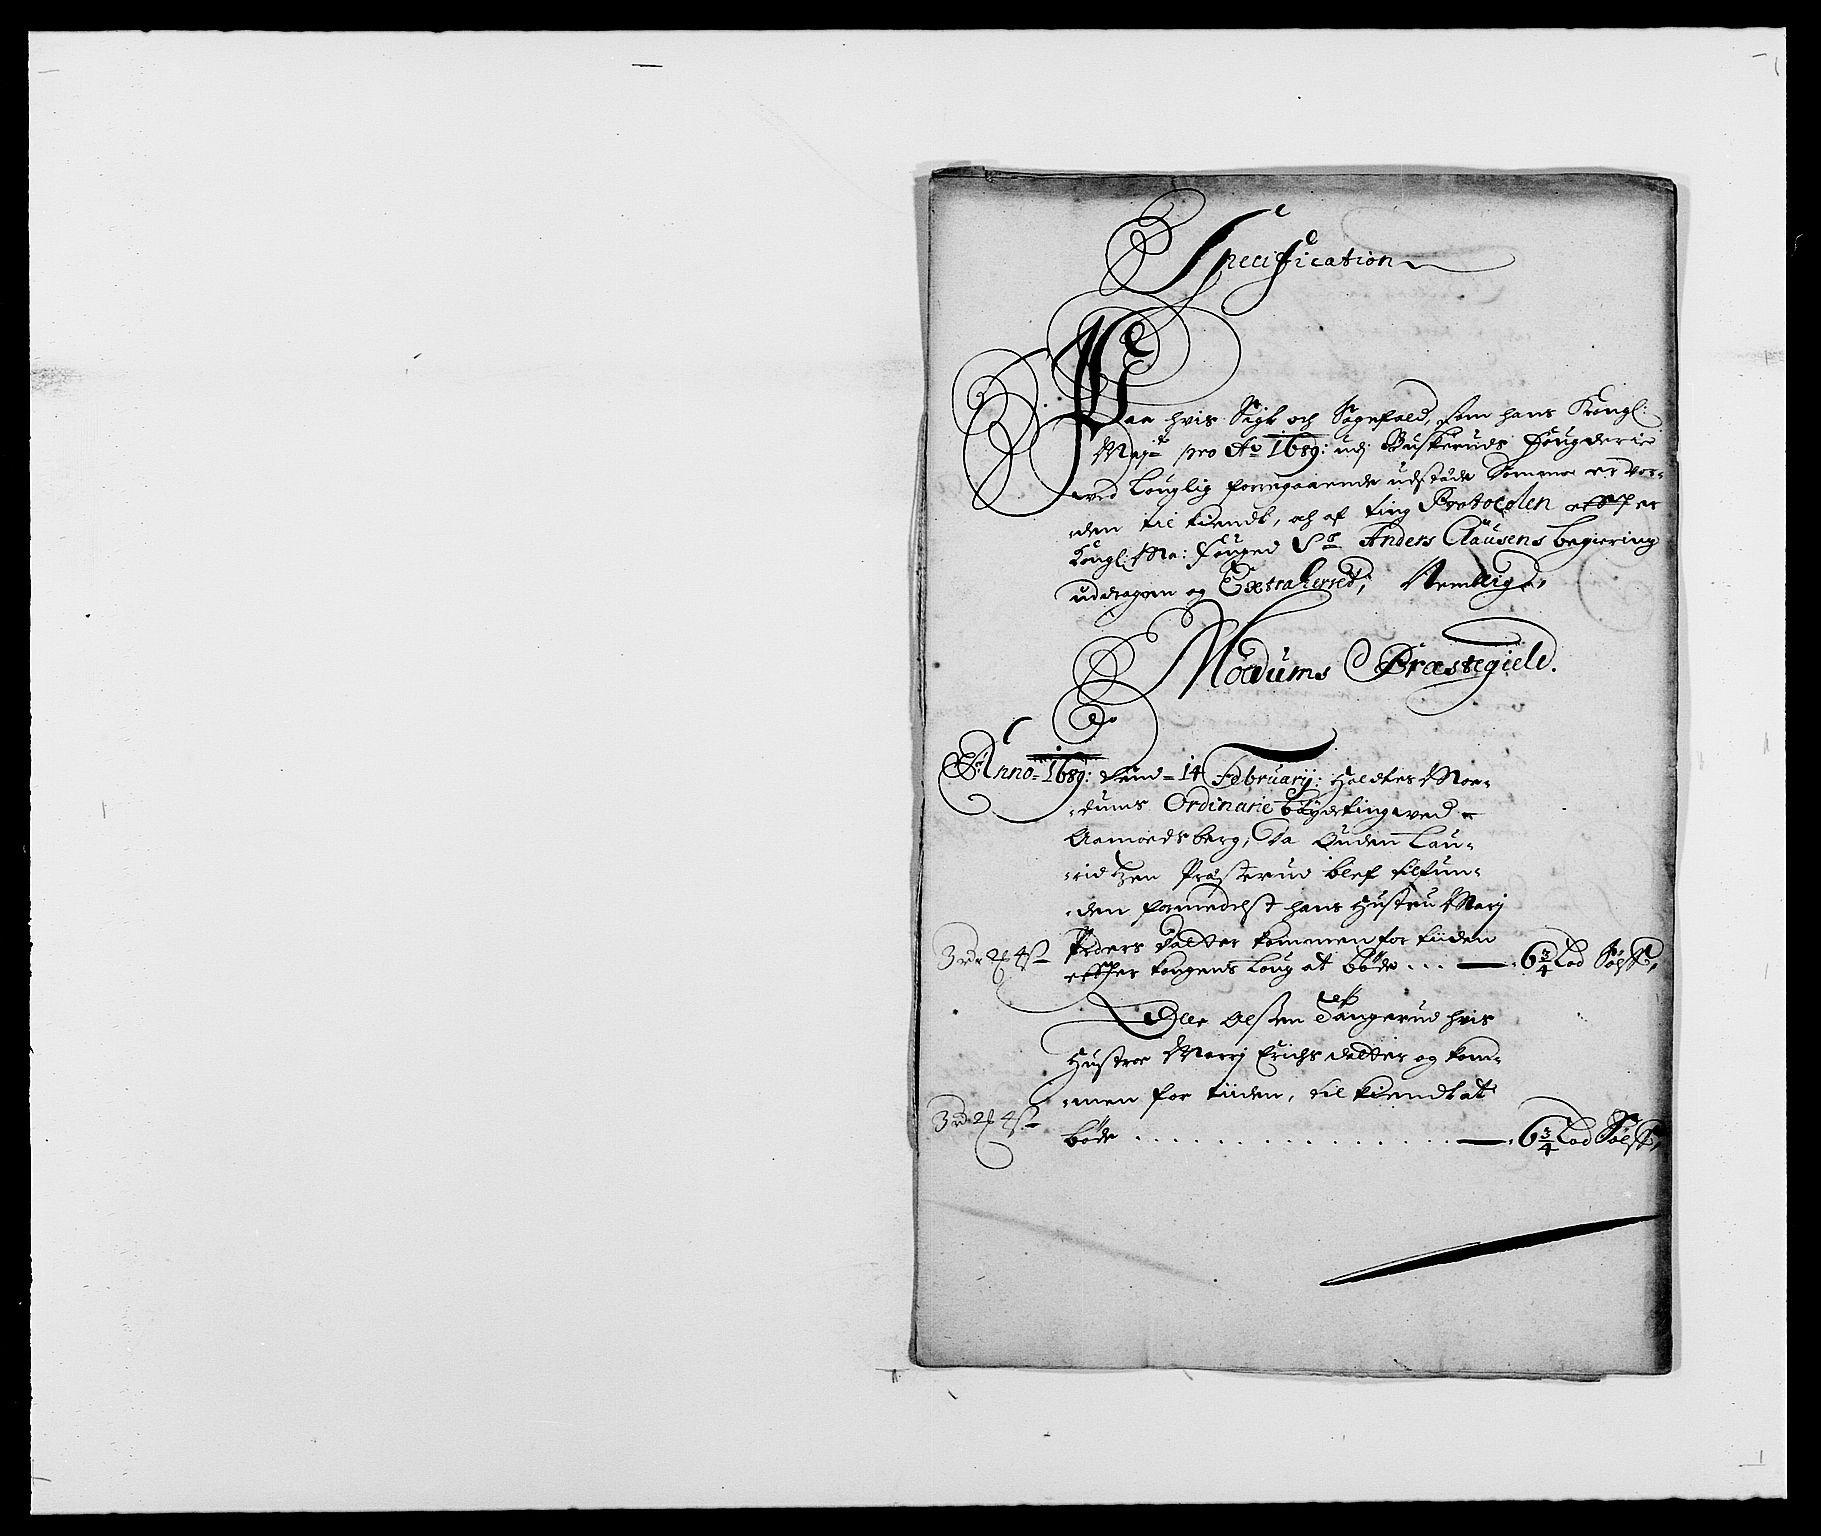 RA, Rentekammeret inntil 1814, Reviderte regnskaper, Fogderegnskap, R25/L1680: Fogderegnskap Buskerud, 1689-1690, s. 50